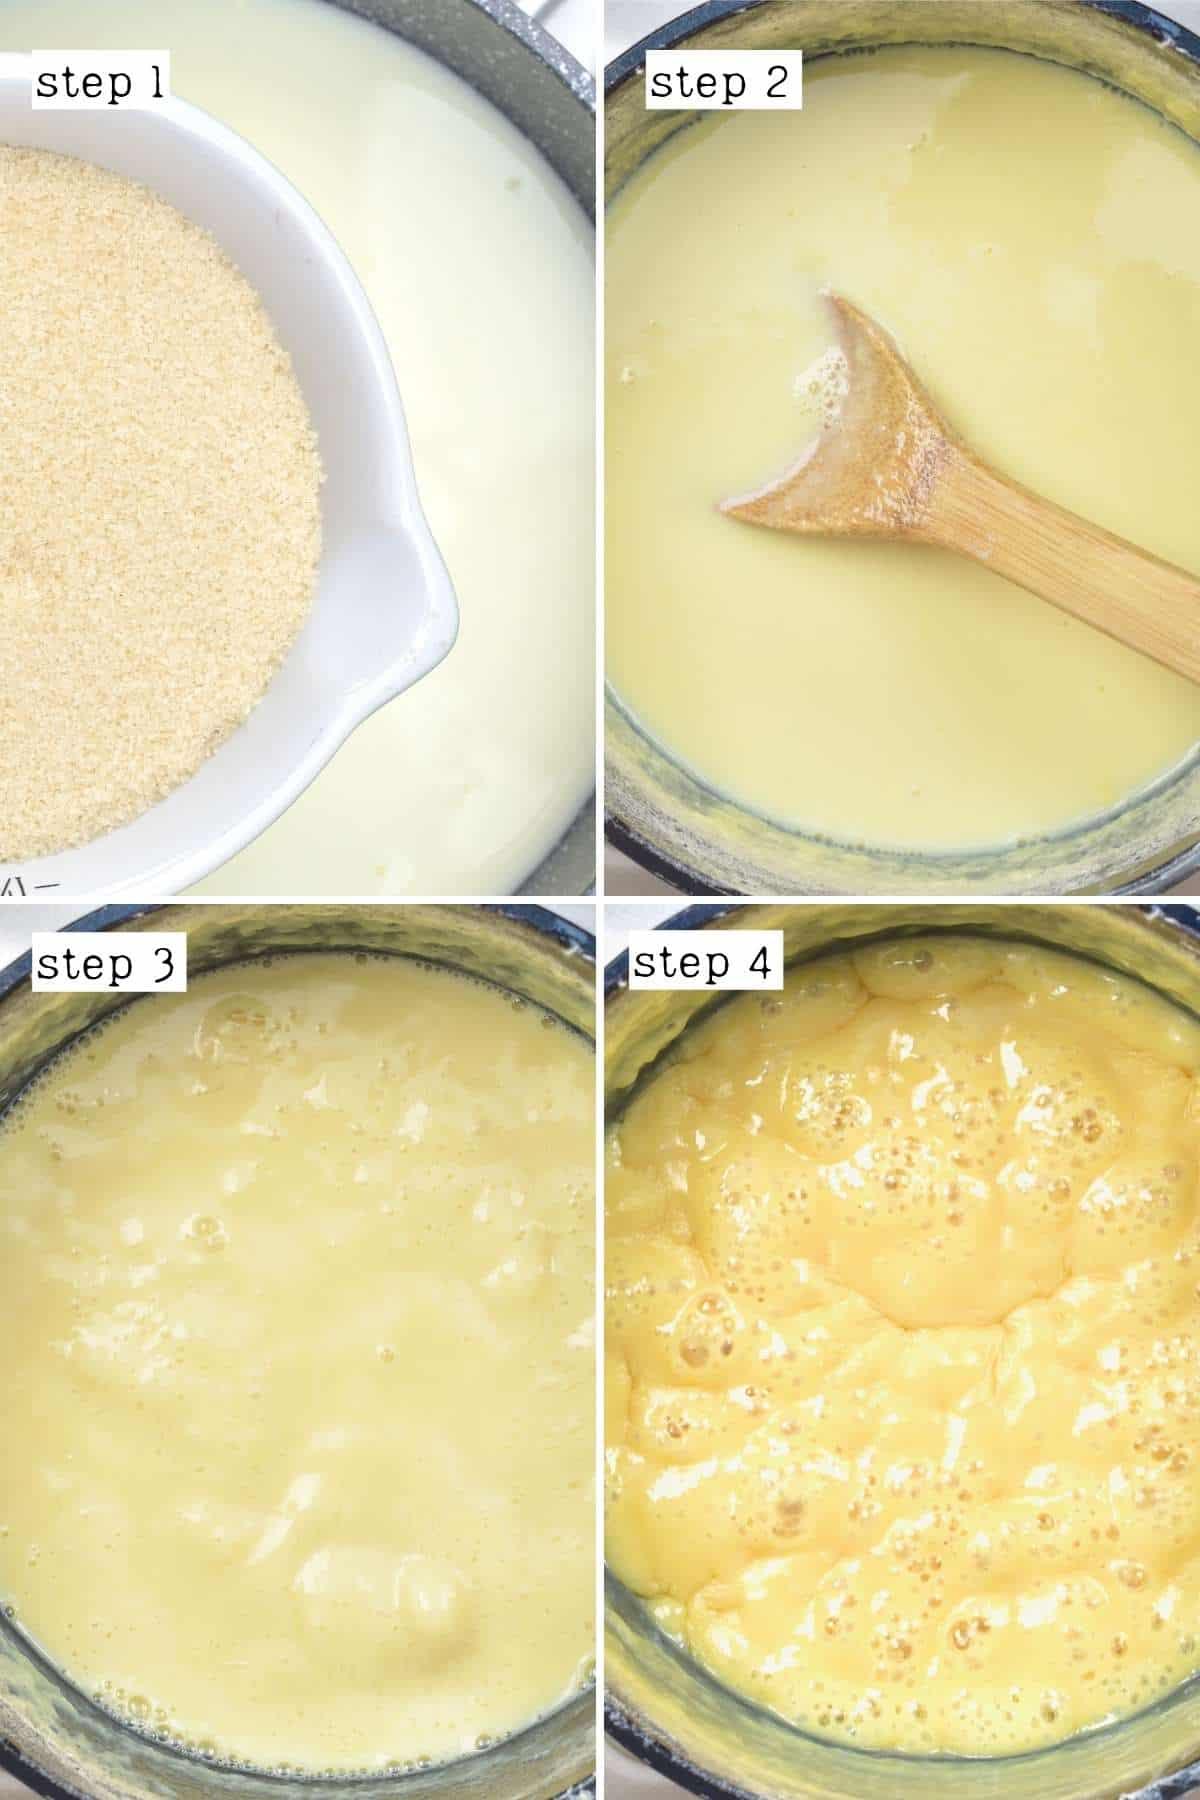 Steps for making condensed milk